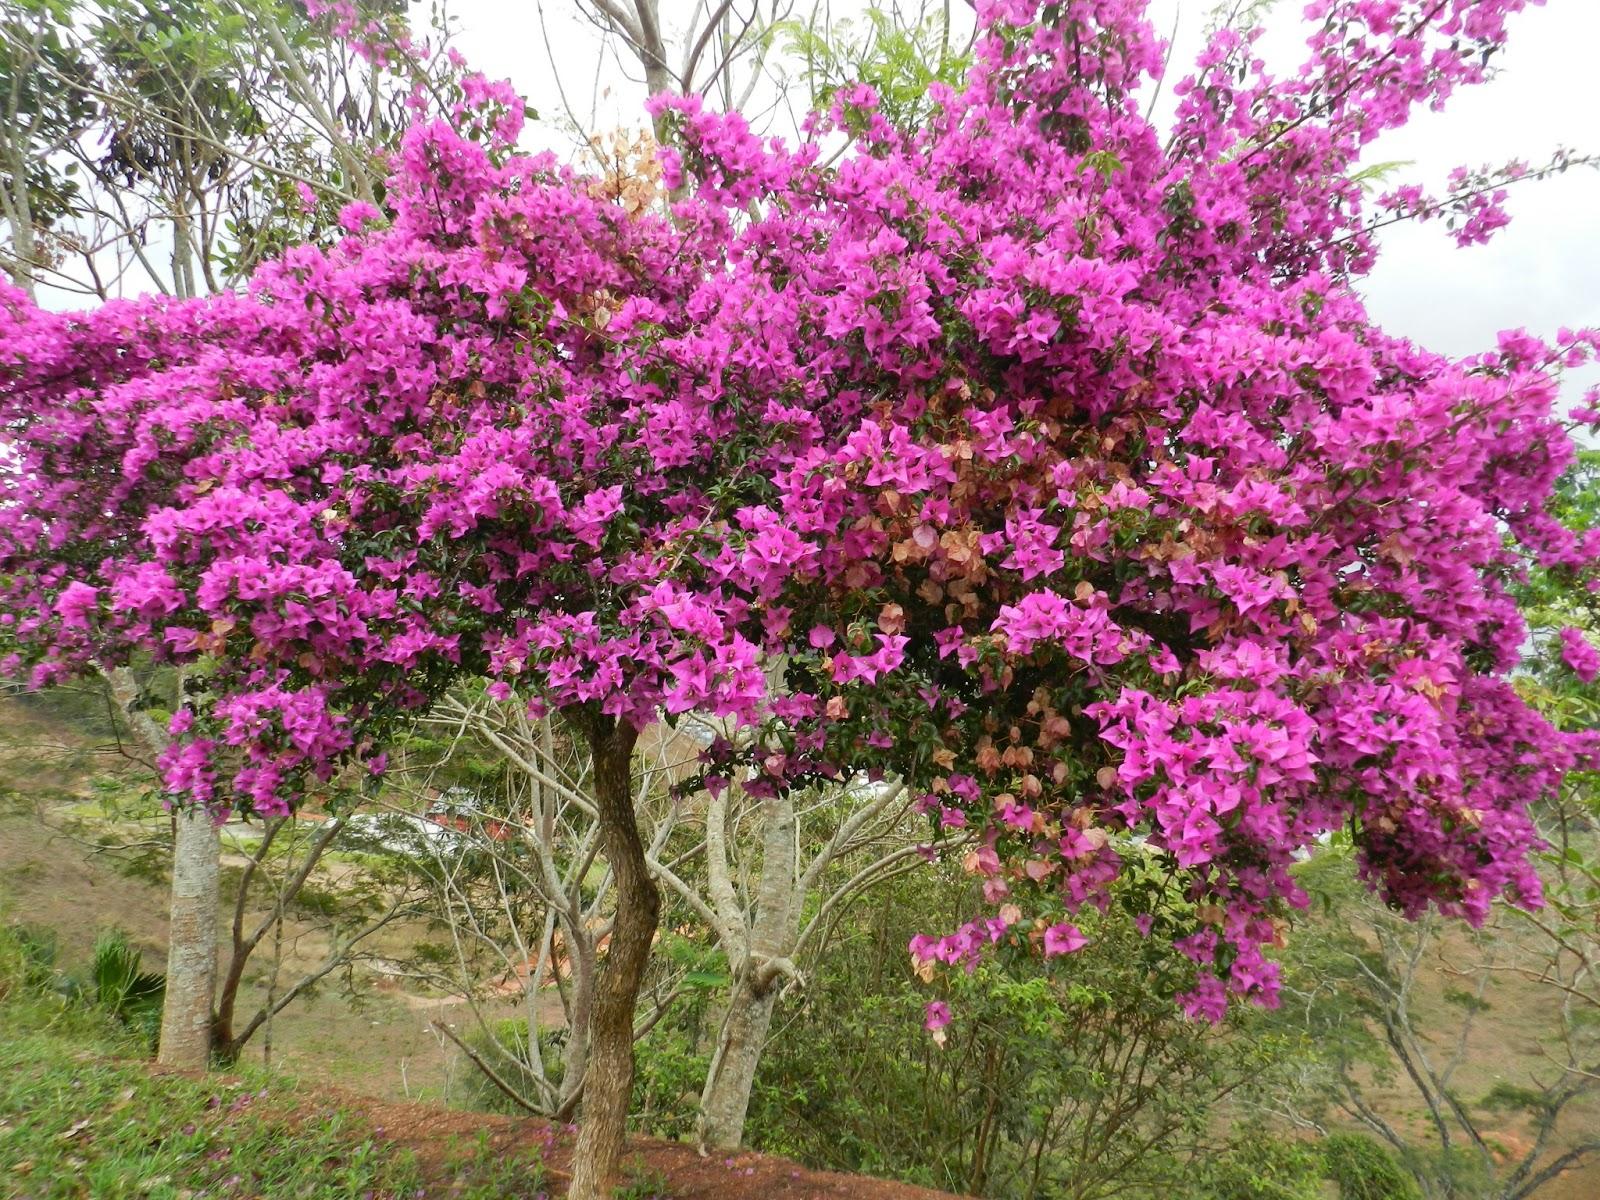 Maria da saudade arbustos para jardins for Arbustos jardin pequeno